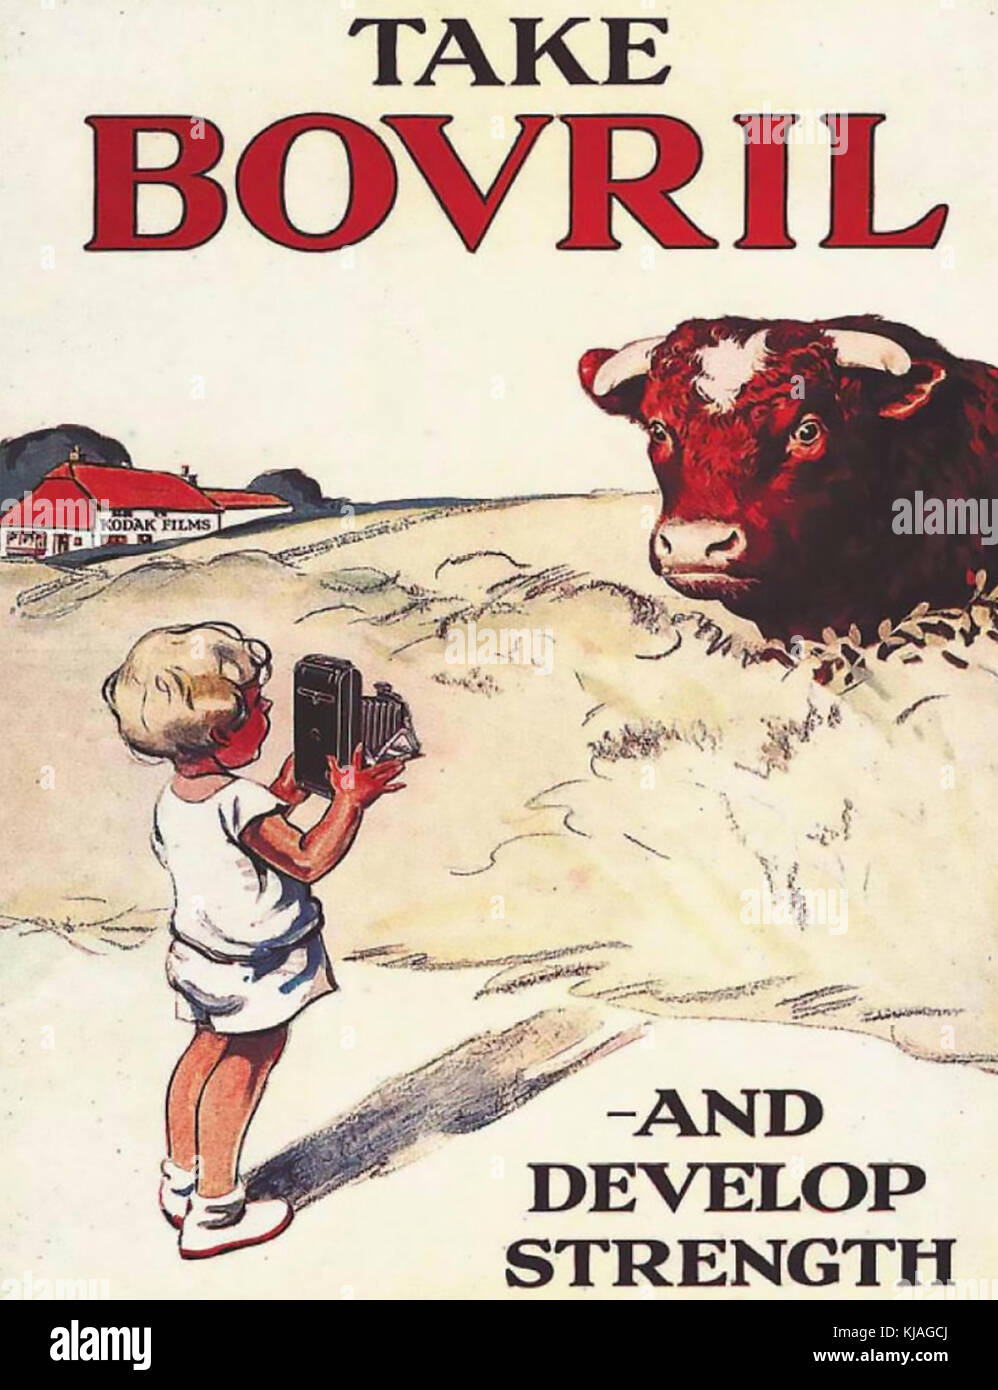 TAKE BOVRIL ADVERT published  1932 - Stock Image